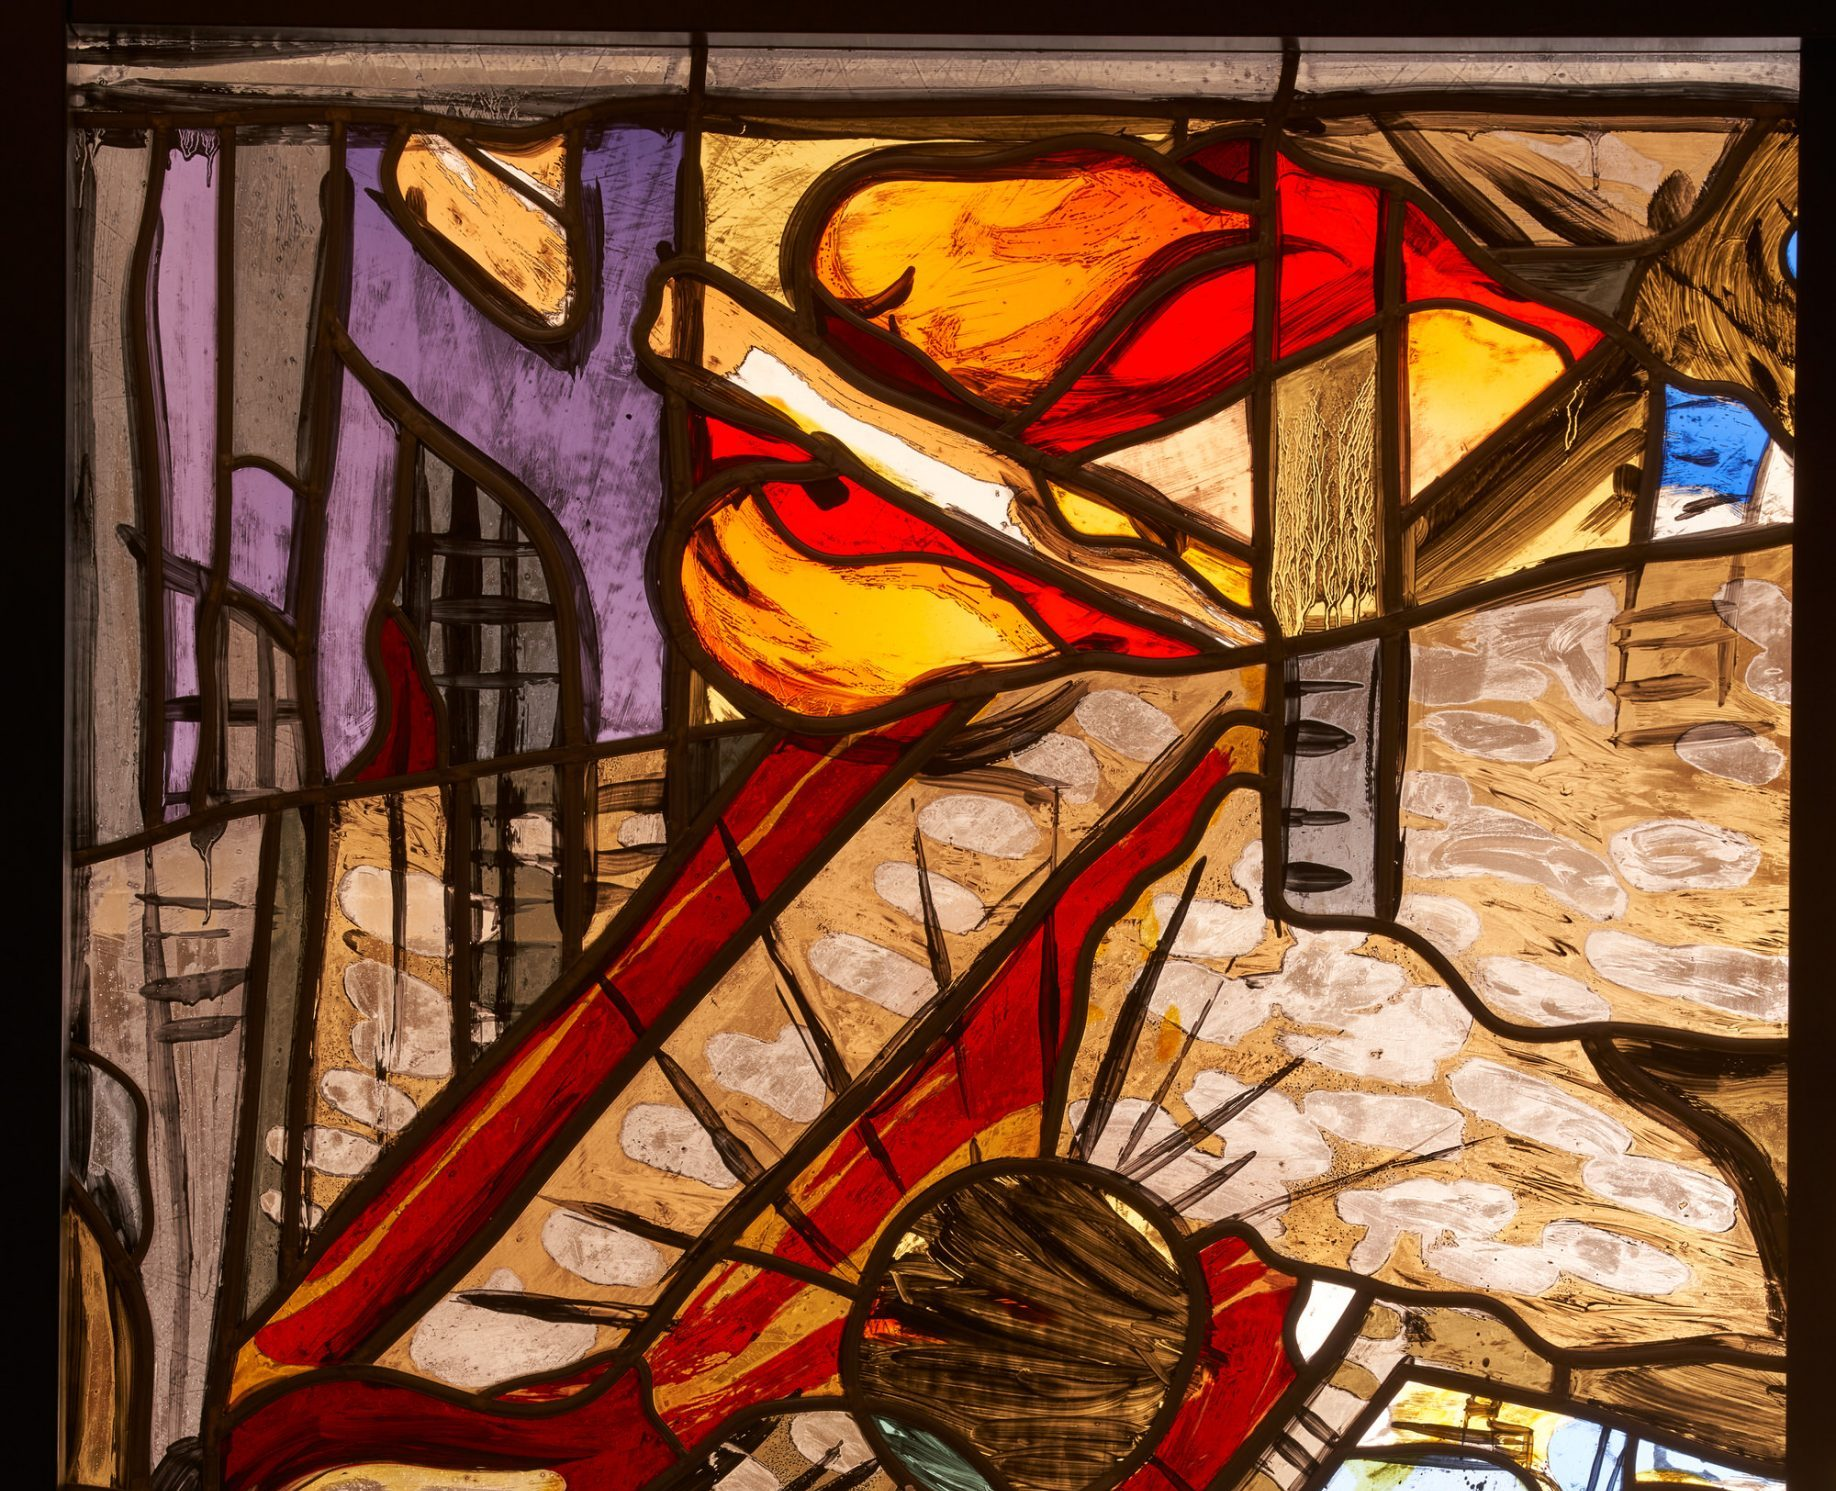 Markus Lüpertz Herbstfenster II